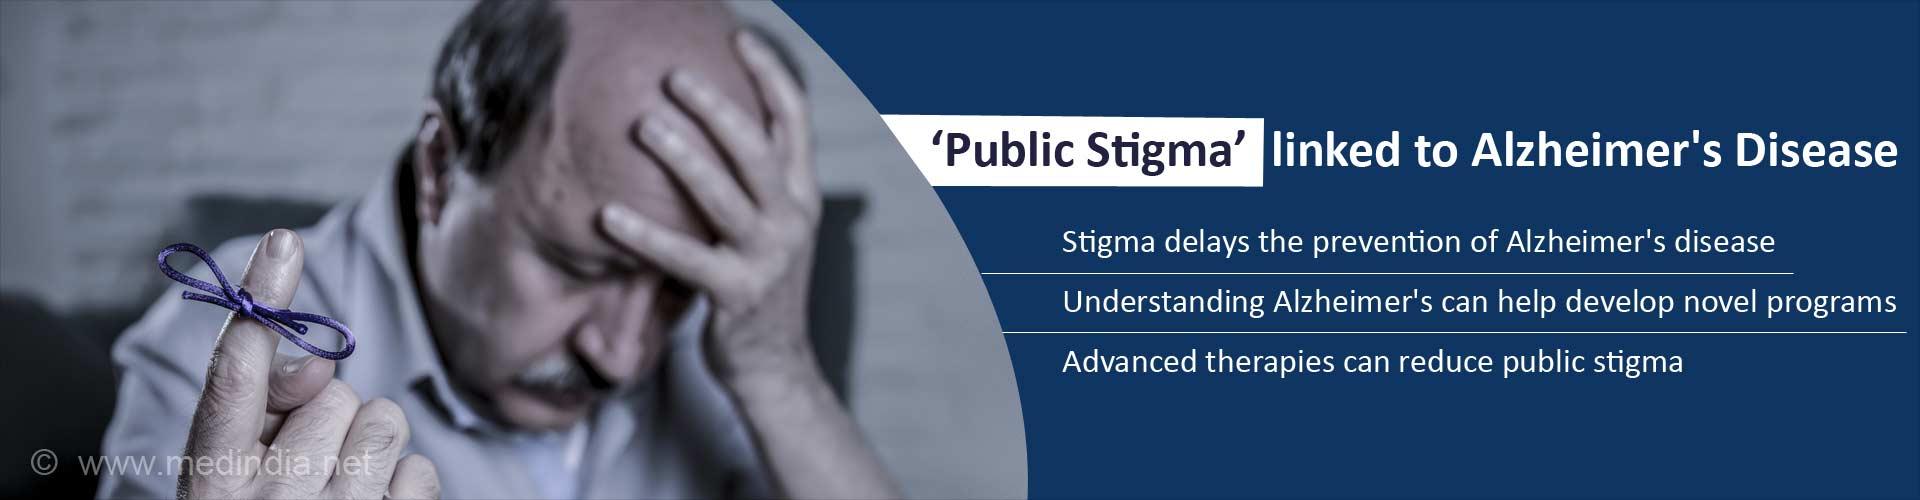 Public stigma linked to Alzheimer's disease - Stigma delays the prevention of Alzheimer's disease - Understanding Alzheimer's can help develop novel programs - Advanced therapies can reduce public stigma